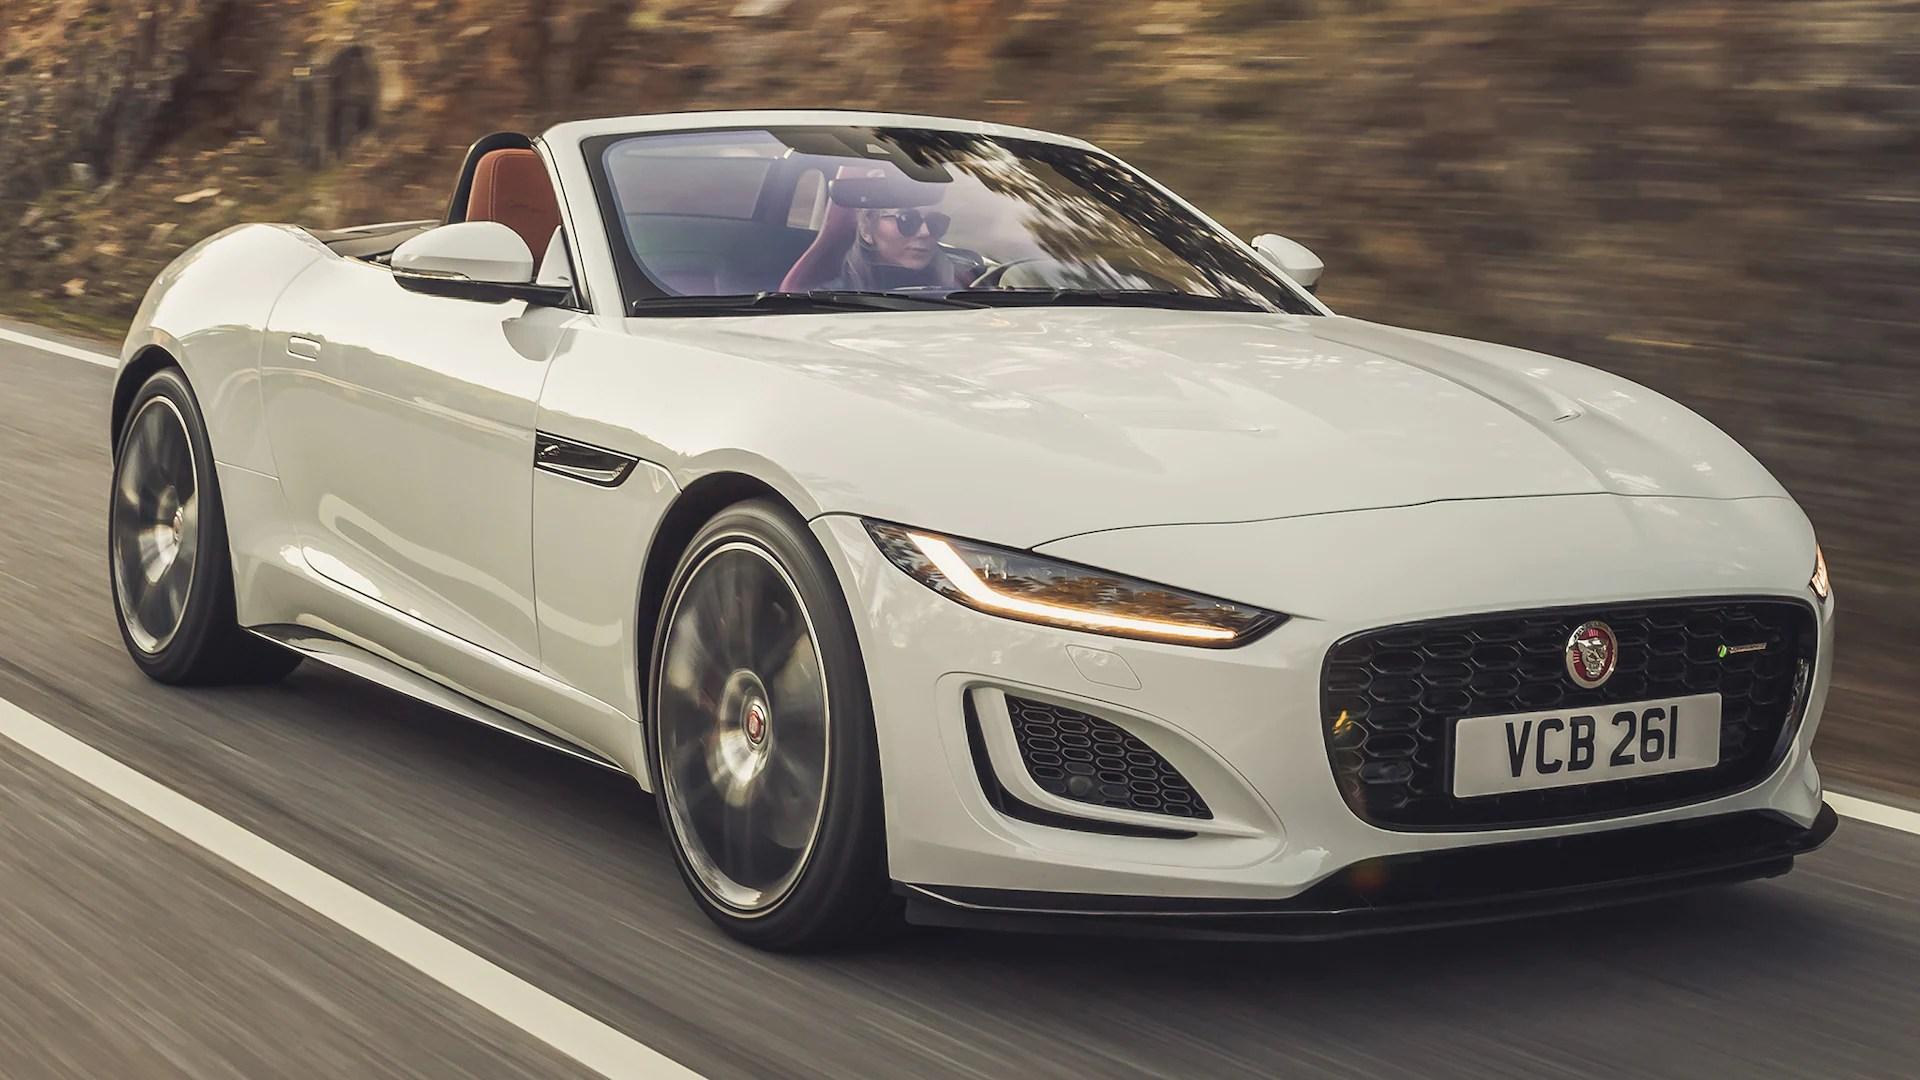 The car's jlr d6a platform is based on a shortened version of the xk's platform. 2022 Jaguar F Type Buyer S Guide Reviews Specs Comparisons